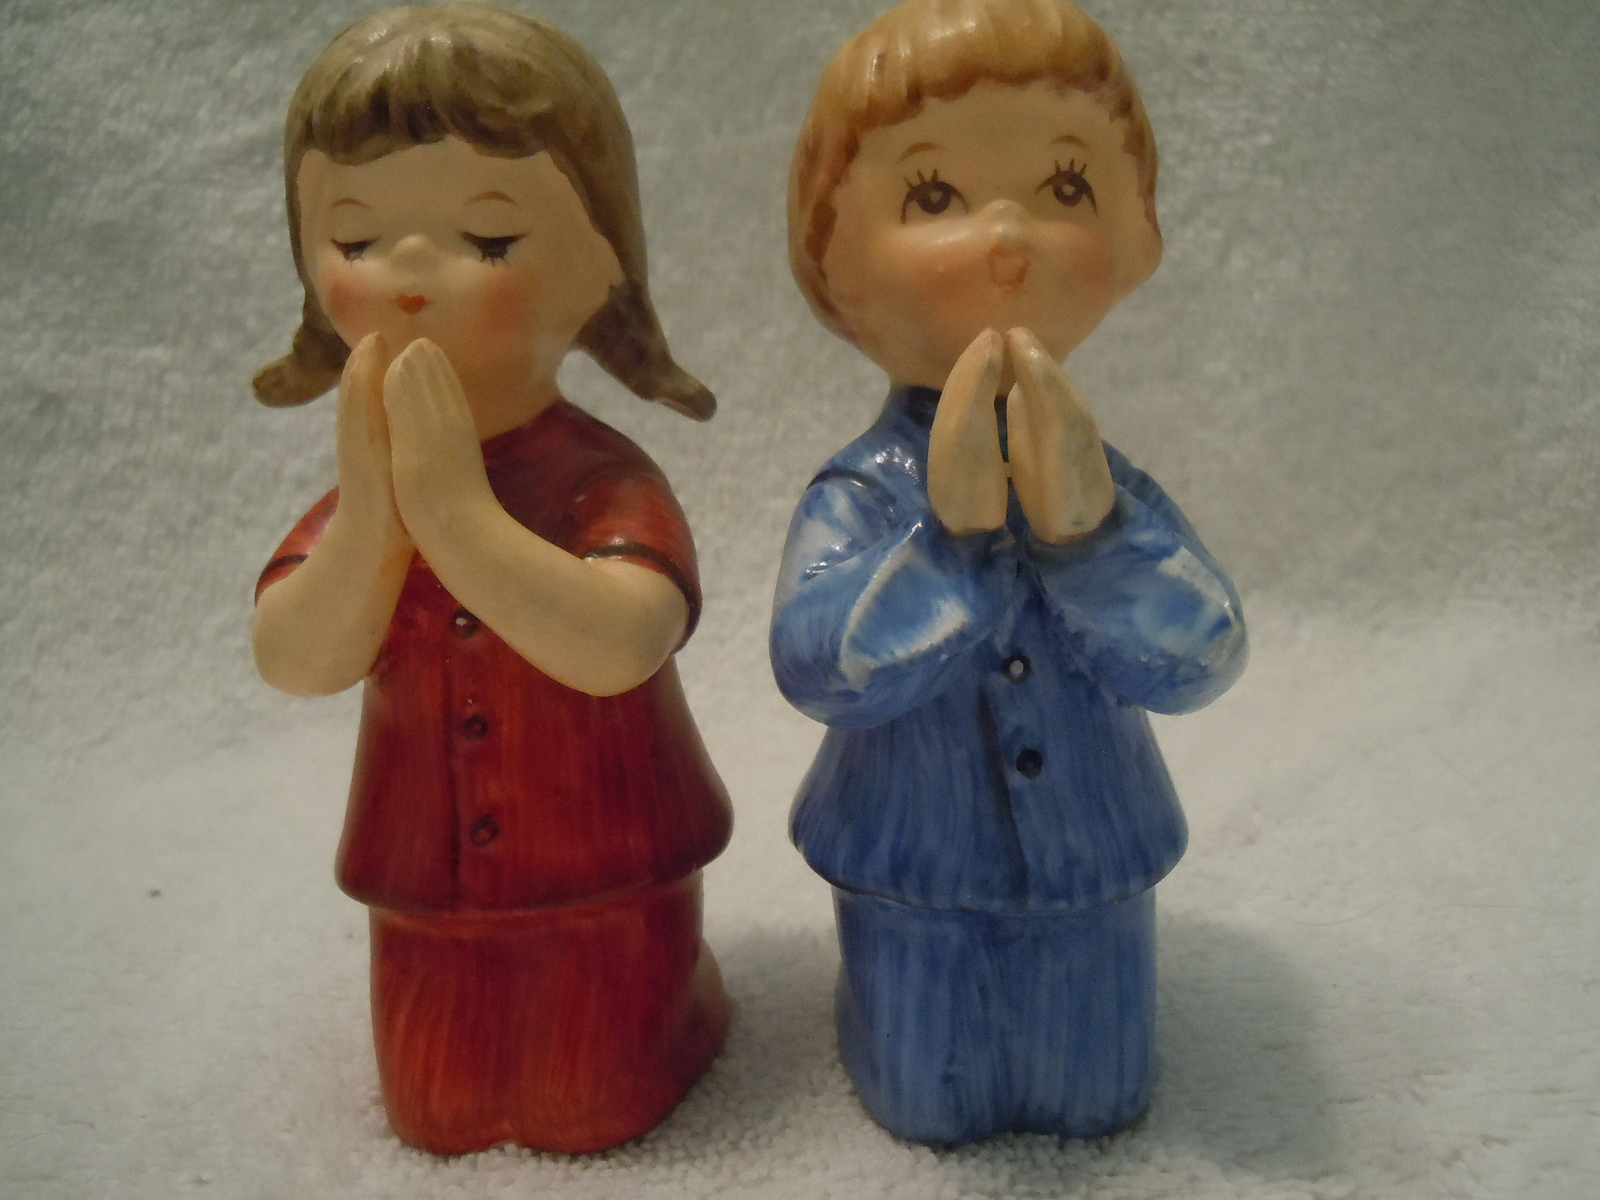 Vintage Schmid Bros Praying Boy And Girl Figurines - $6.99